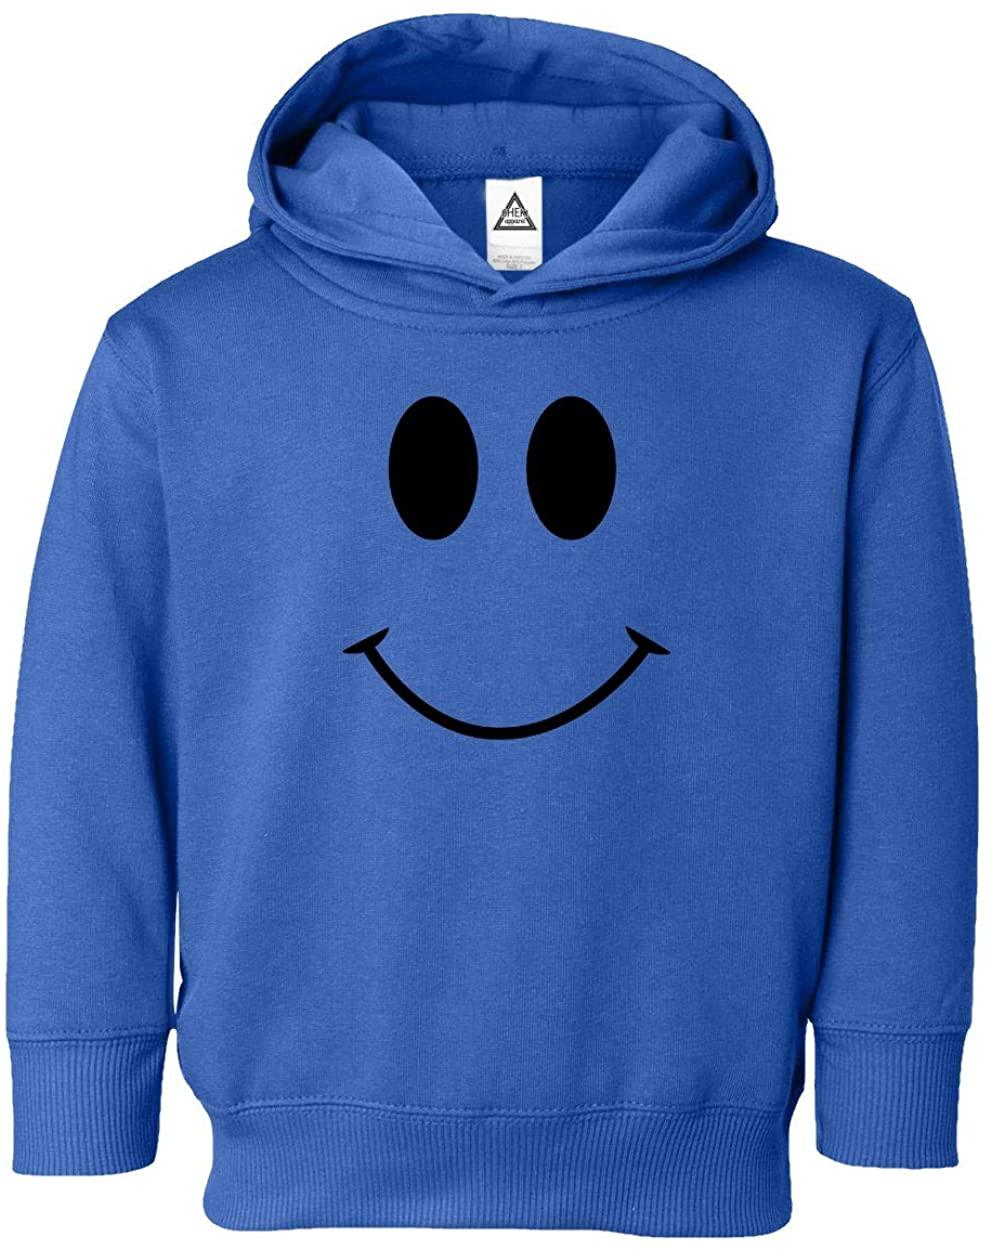 Sheki Apparel Smile Face Cute, Positive, Happy Smiling Little Kids Hoodie Toddler Sweatshirt (Black,